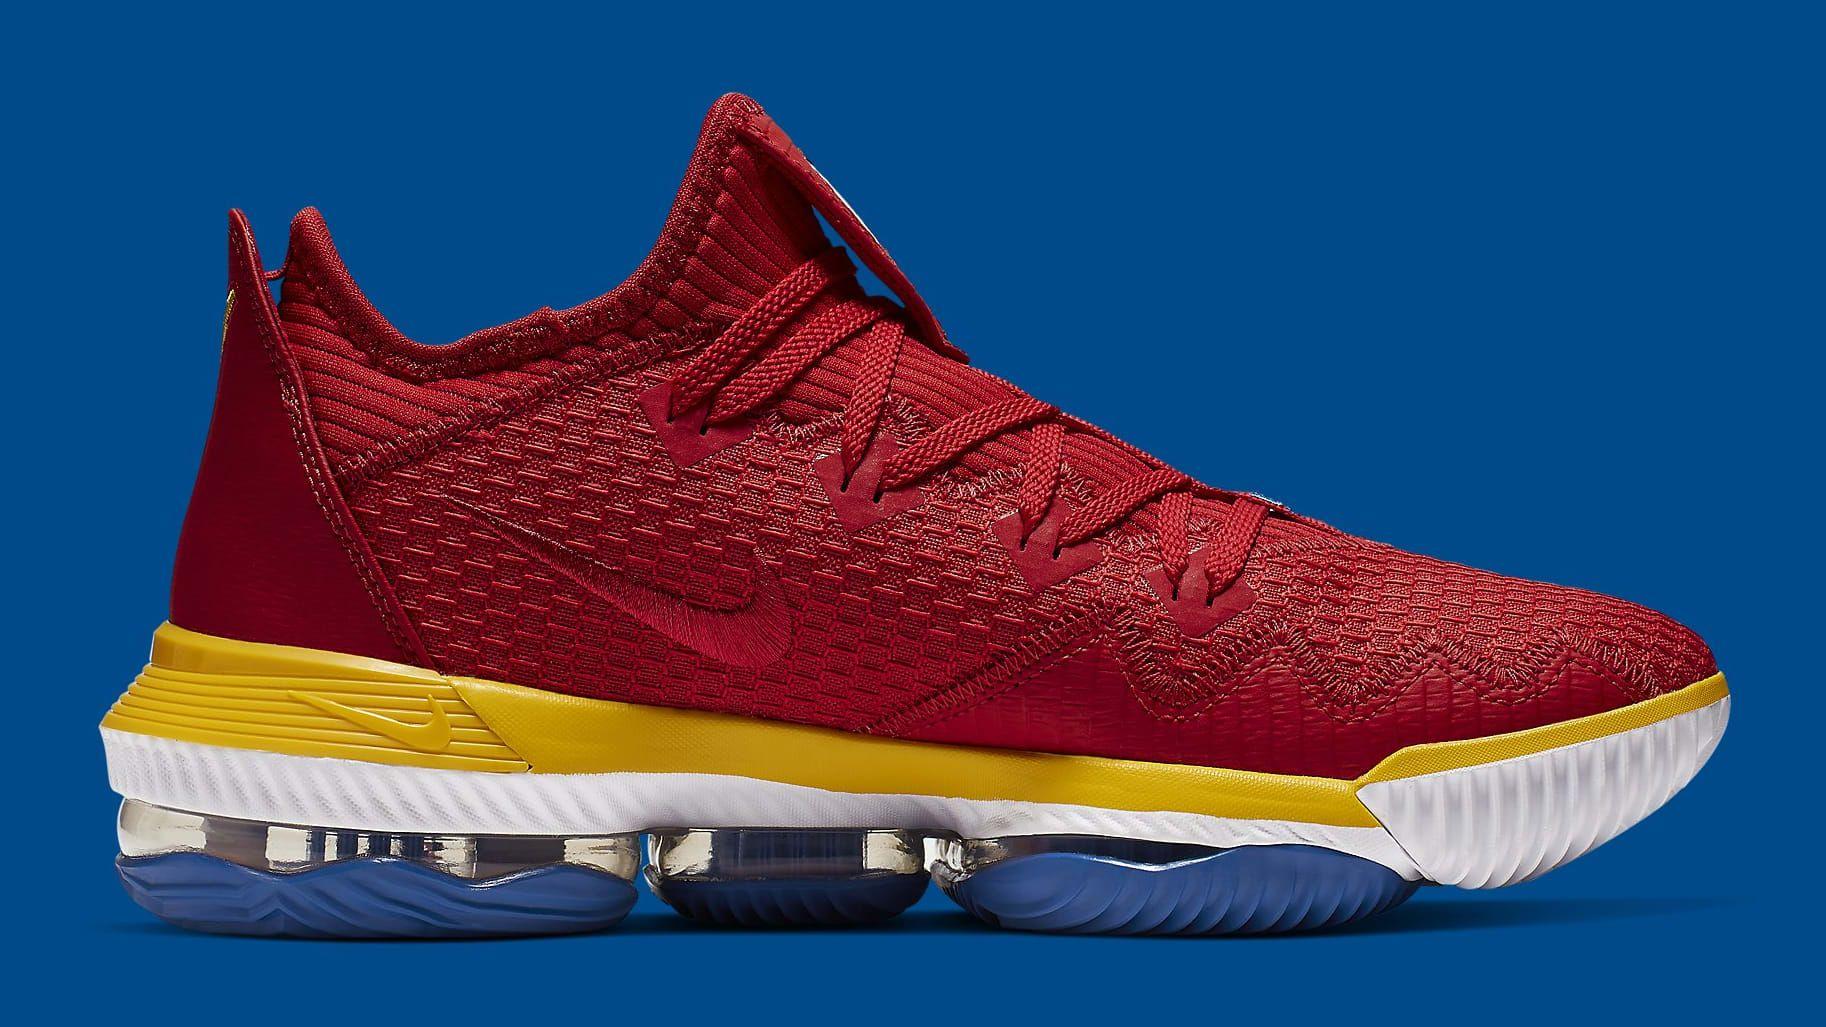 Nike LeBron 16 Low SuperBron Release